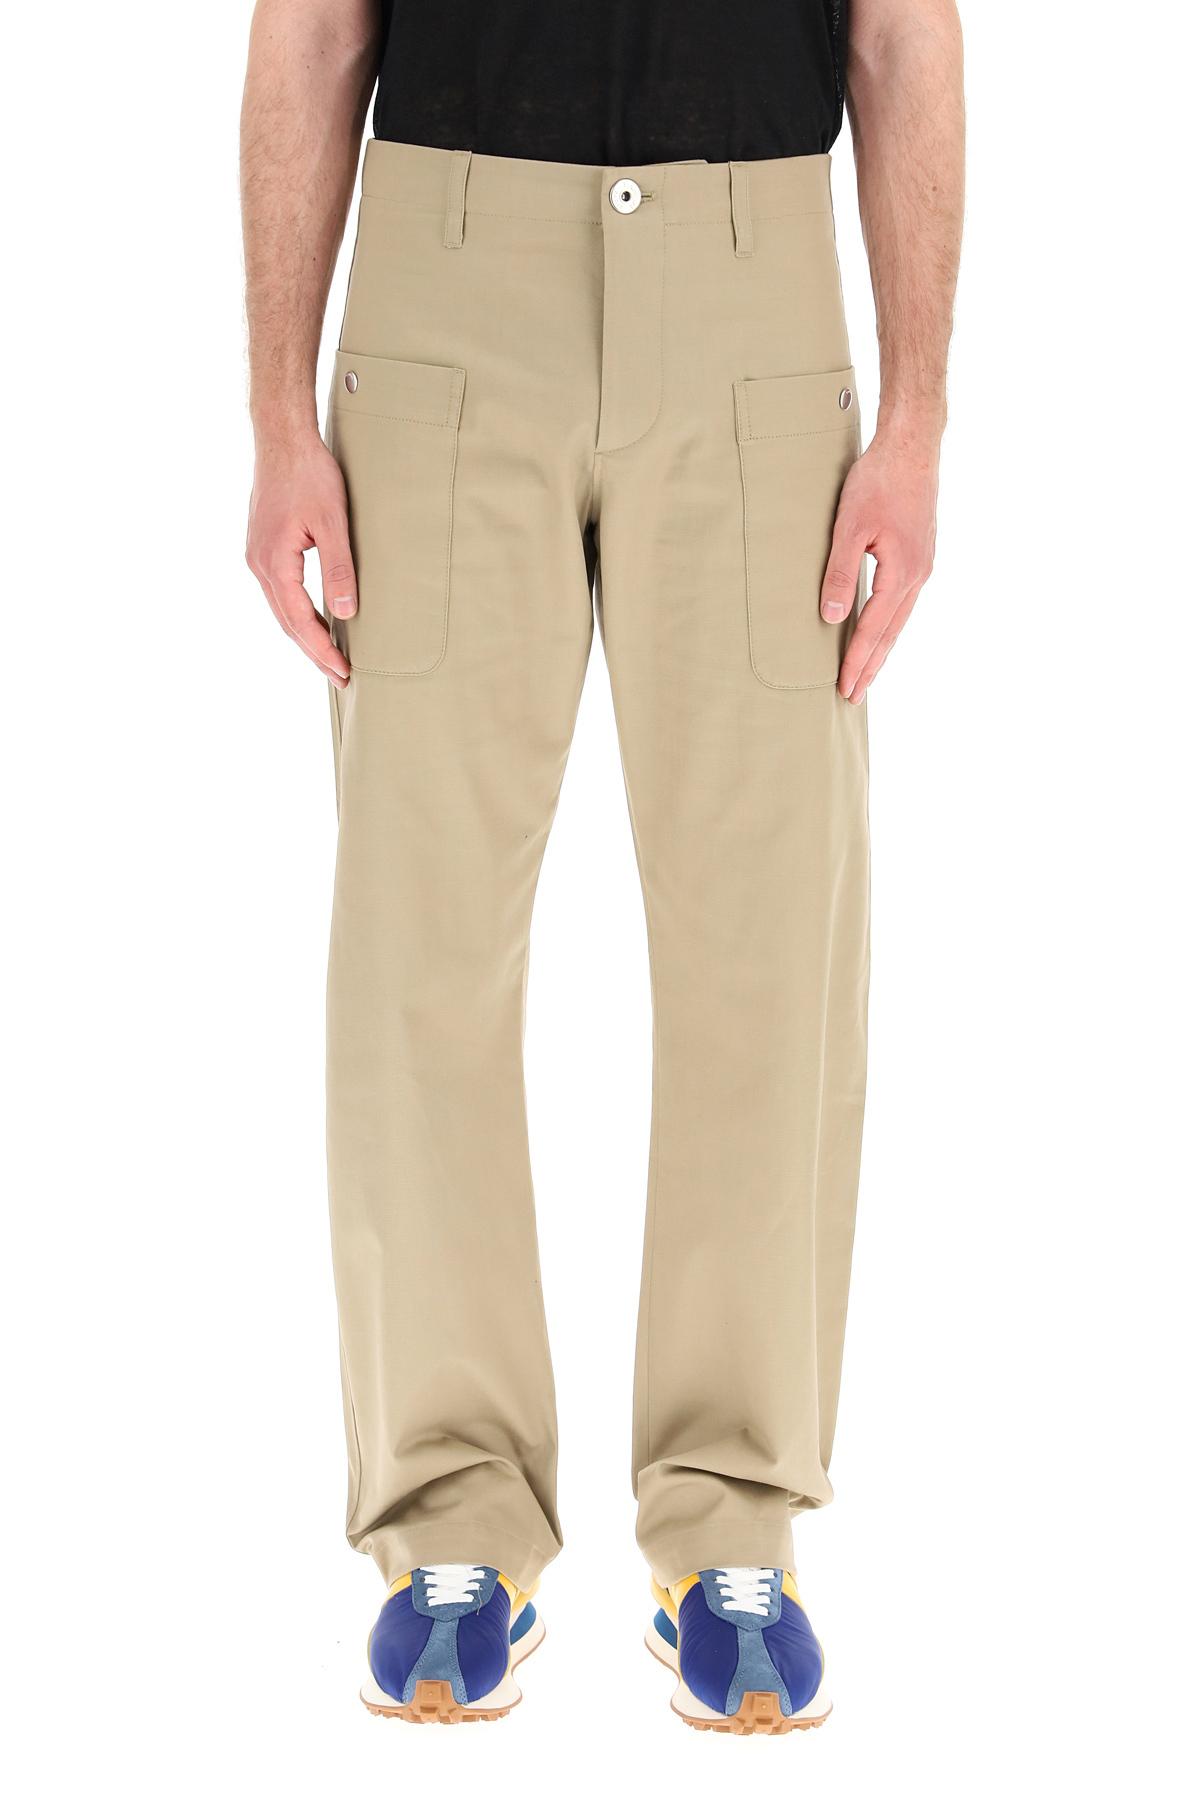 Lanvin pantaloni cargo